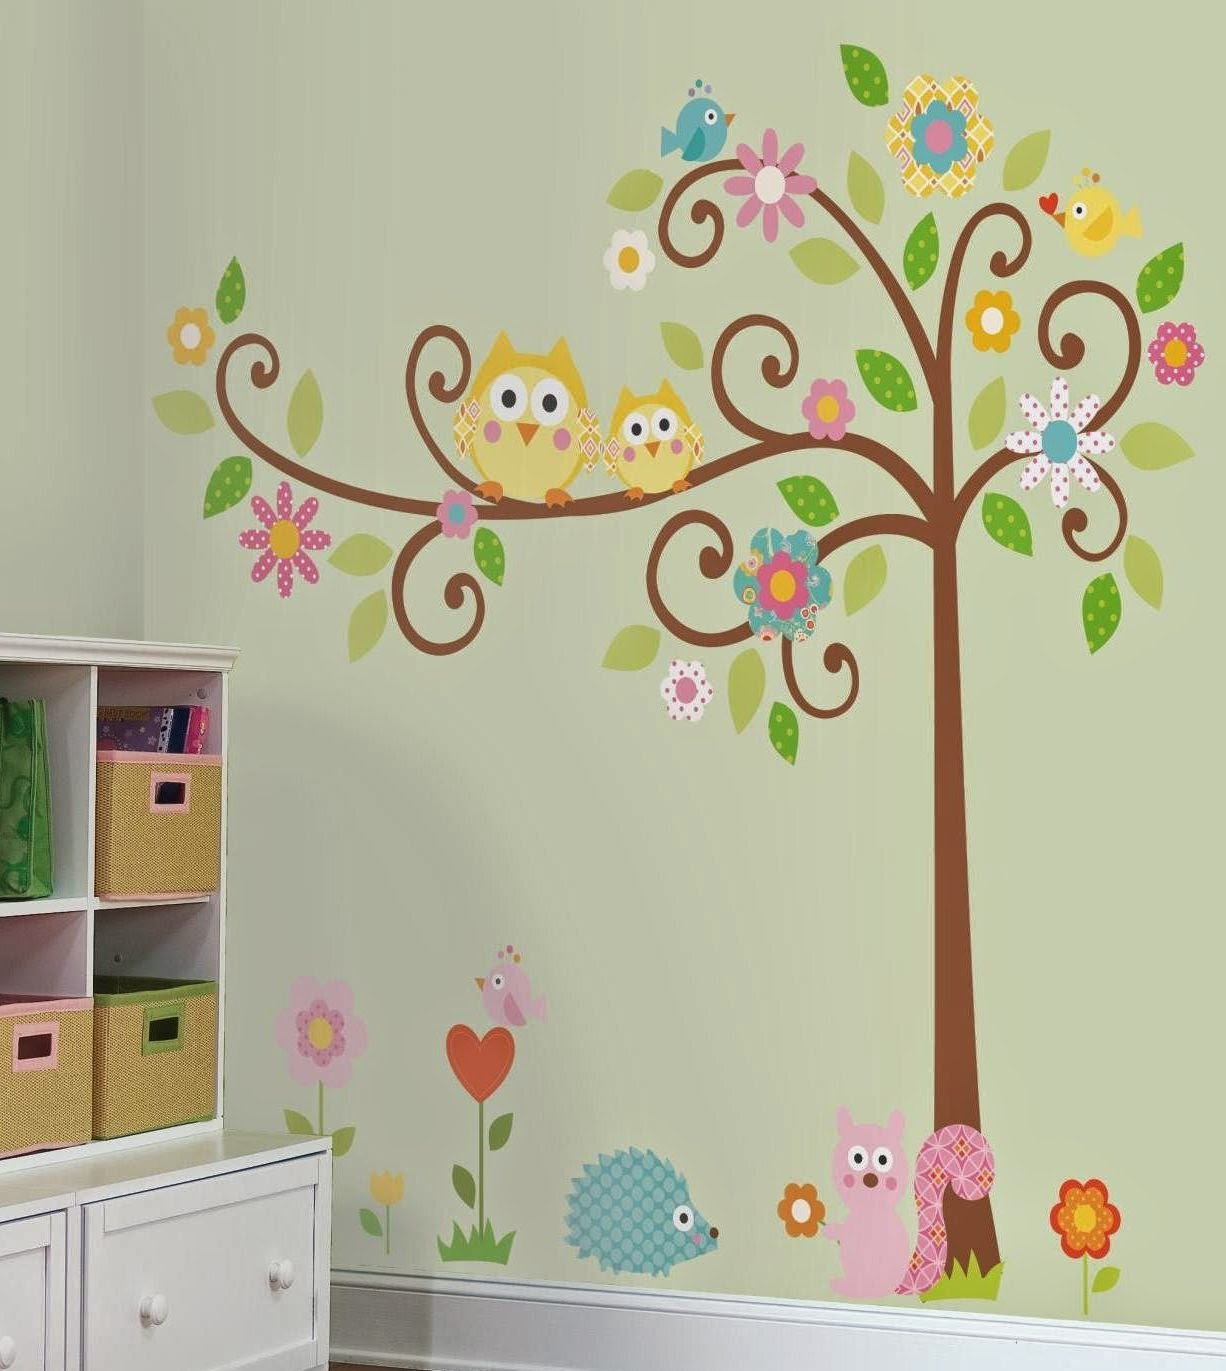 Owl Decor For Bedroom Owl Themed Bedroom